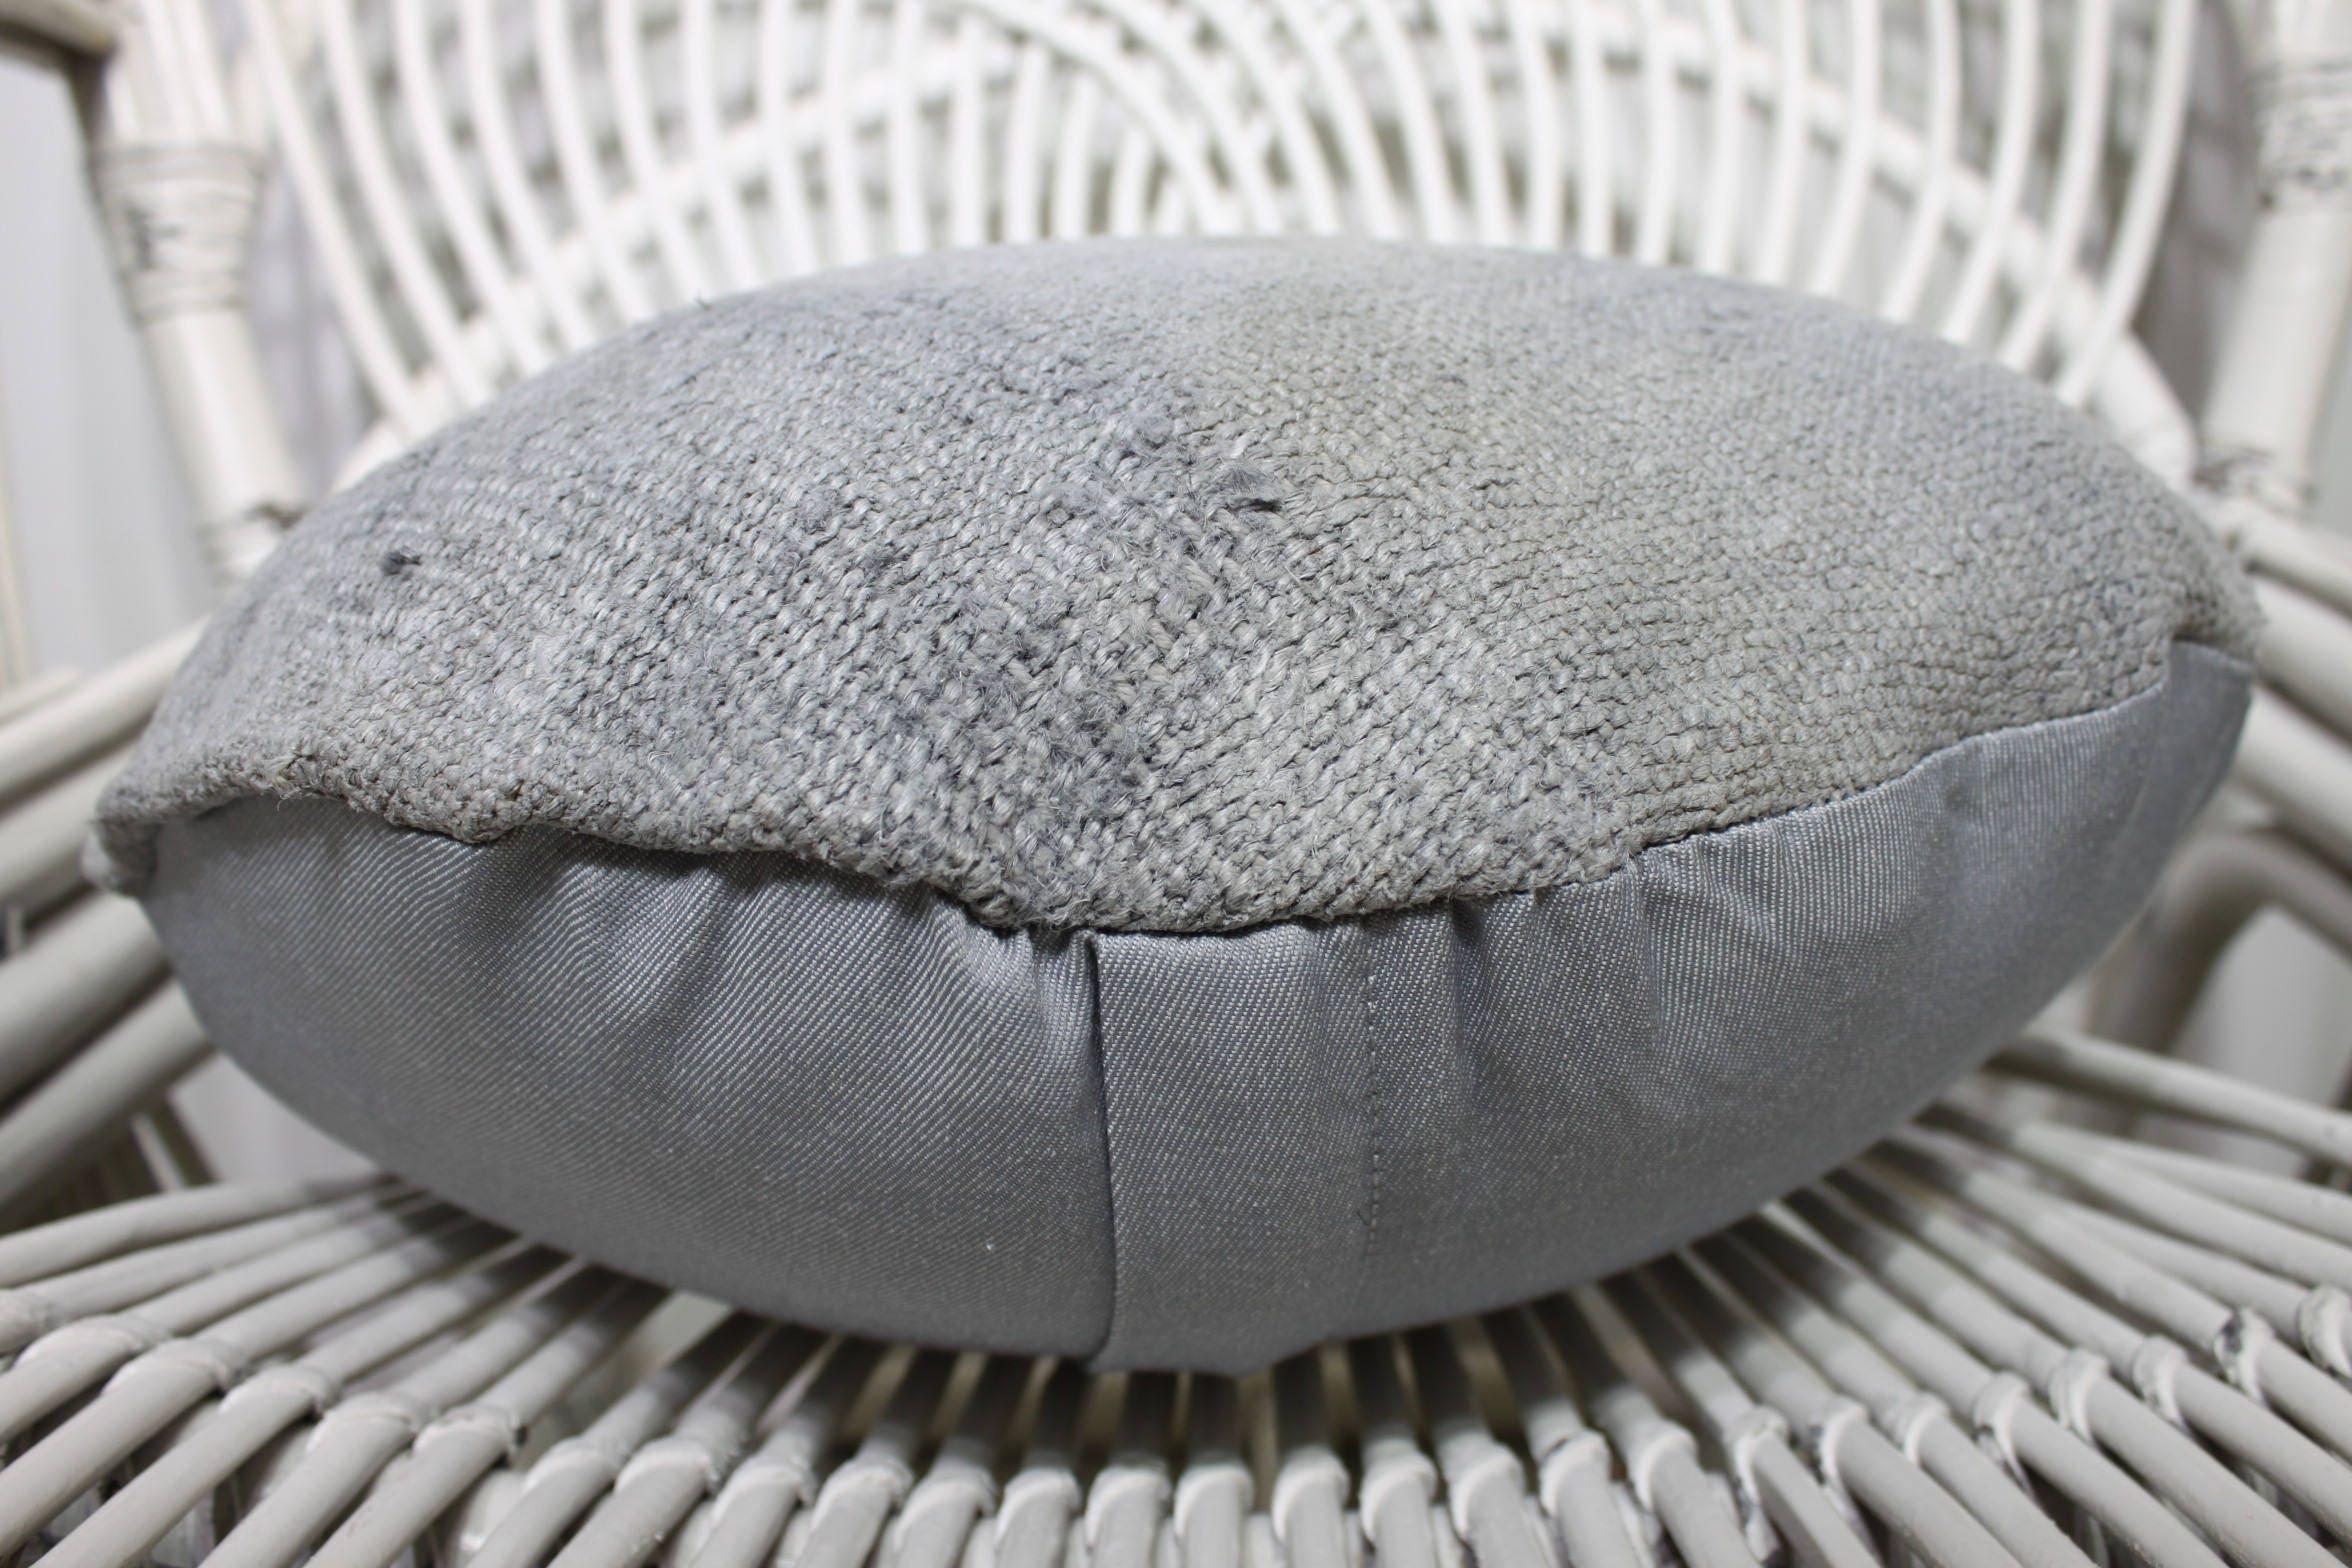 Out Door Pillow Cover Pale Color One Color Sofa Circle Pillow 16x16 Kilim Pillow Round Pillow & Out Door Pillow Cover Pale Color One Color Sofa Circle Pillow ... pezcame.com